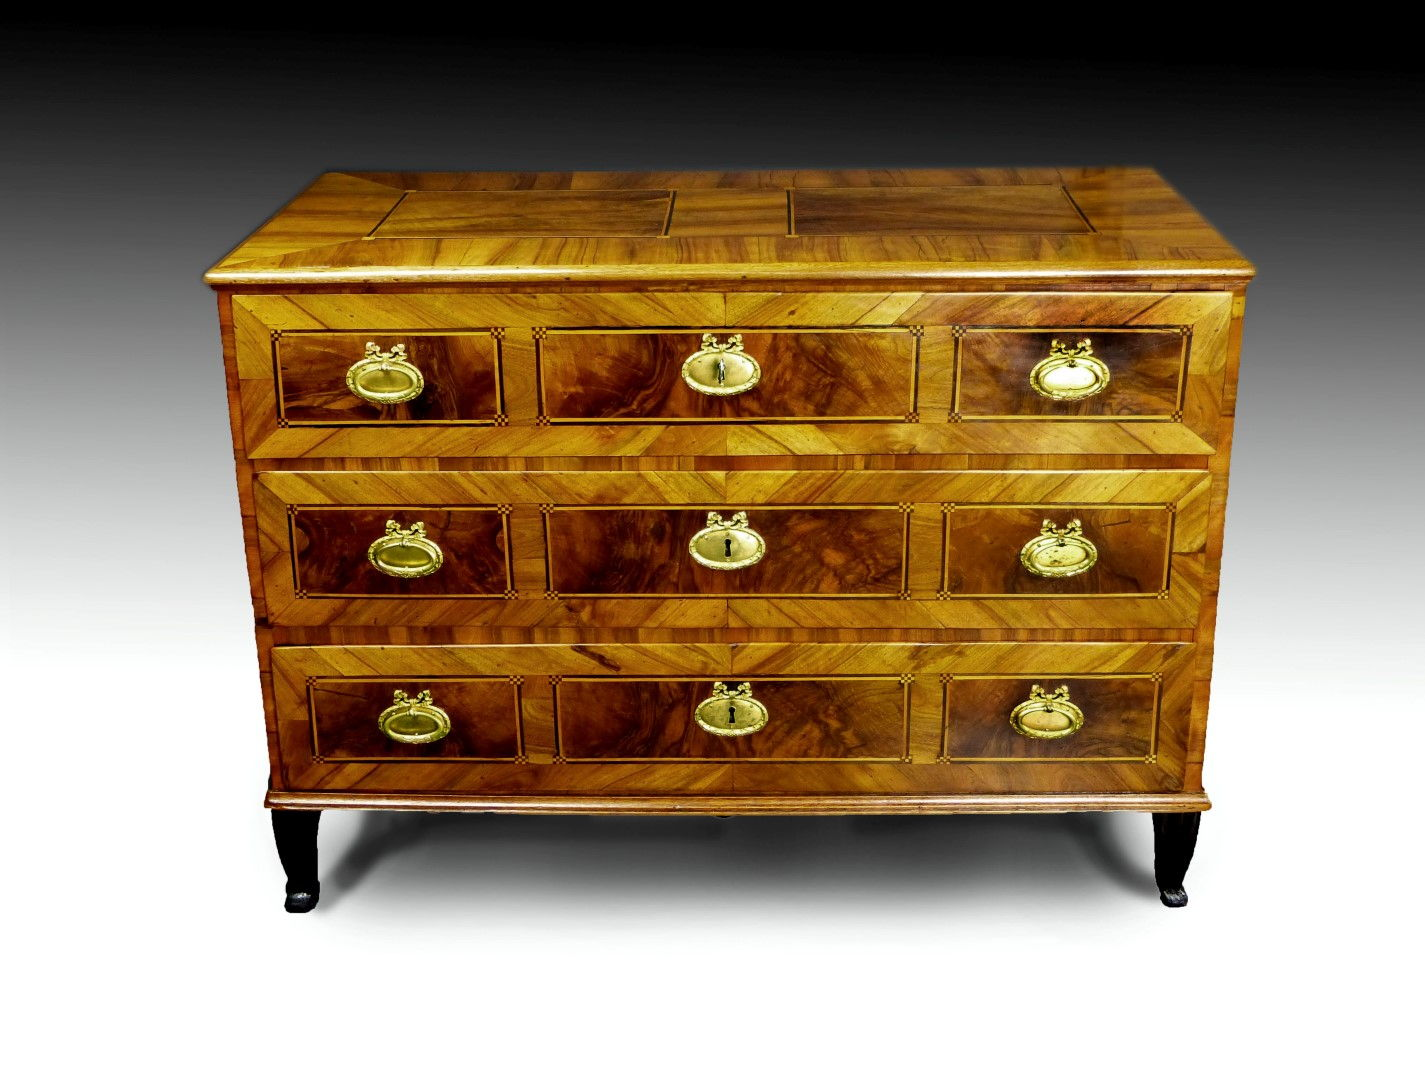 Ver muebles antiguos dise os arquitect nicos - Muebles viejos restaurados ...